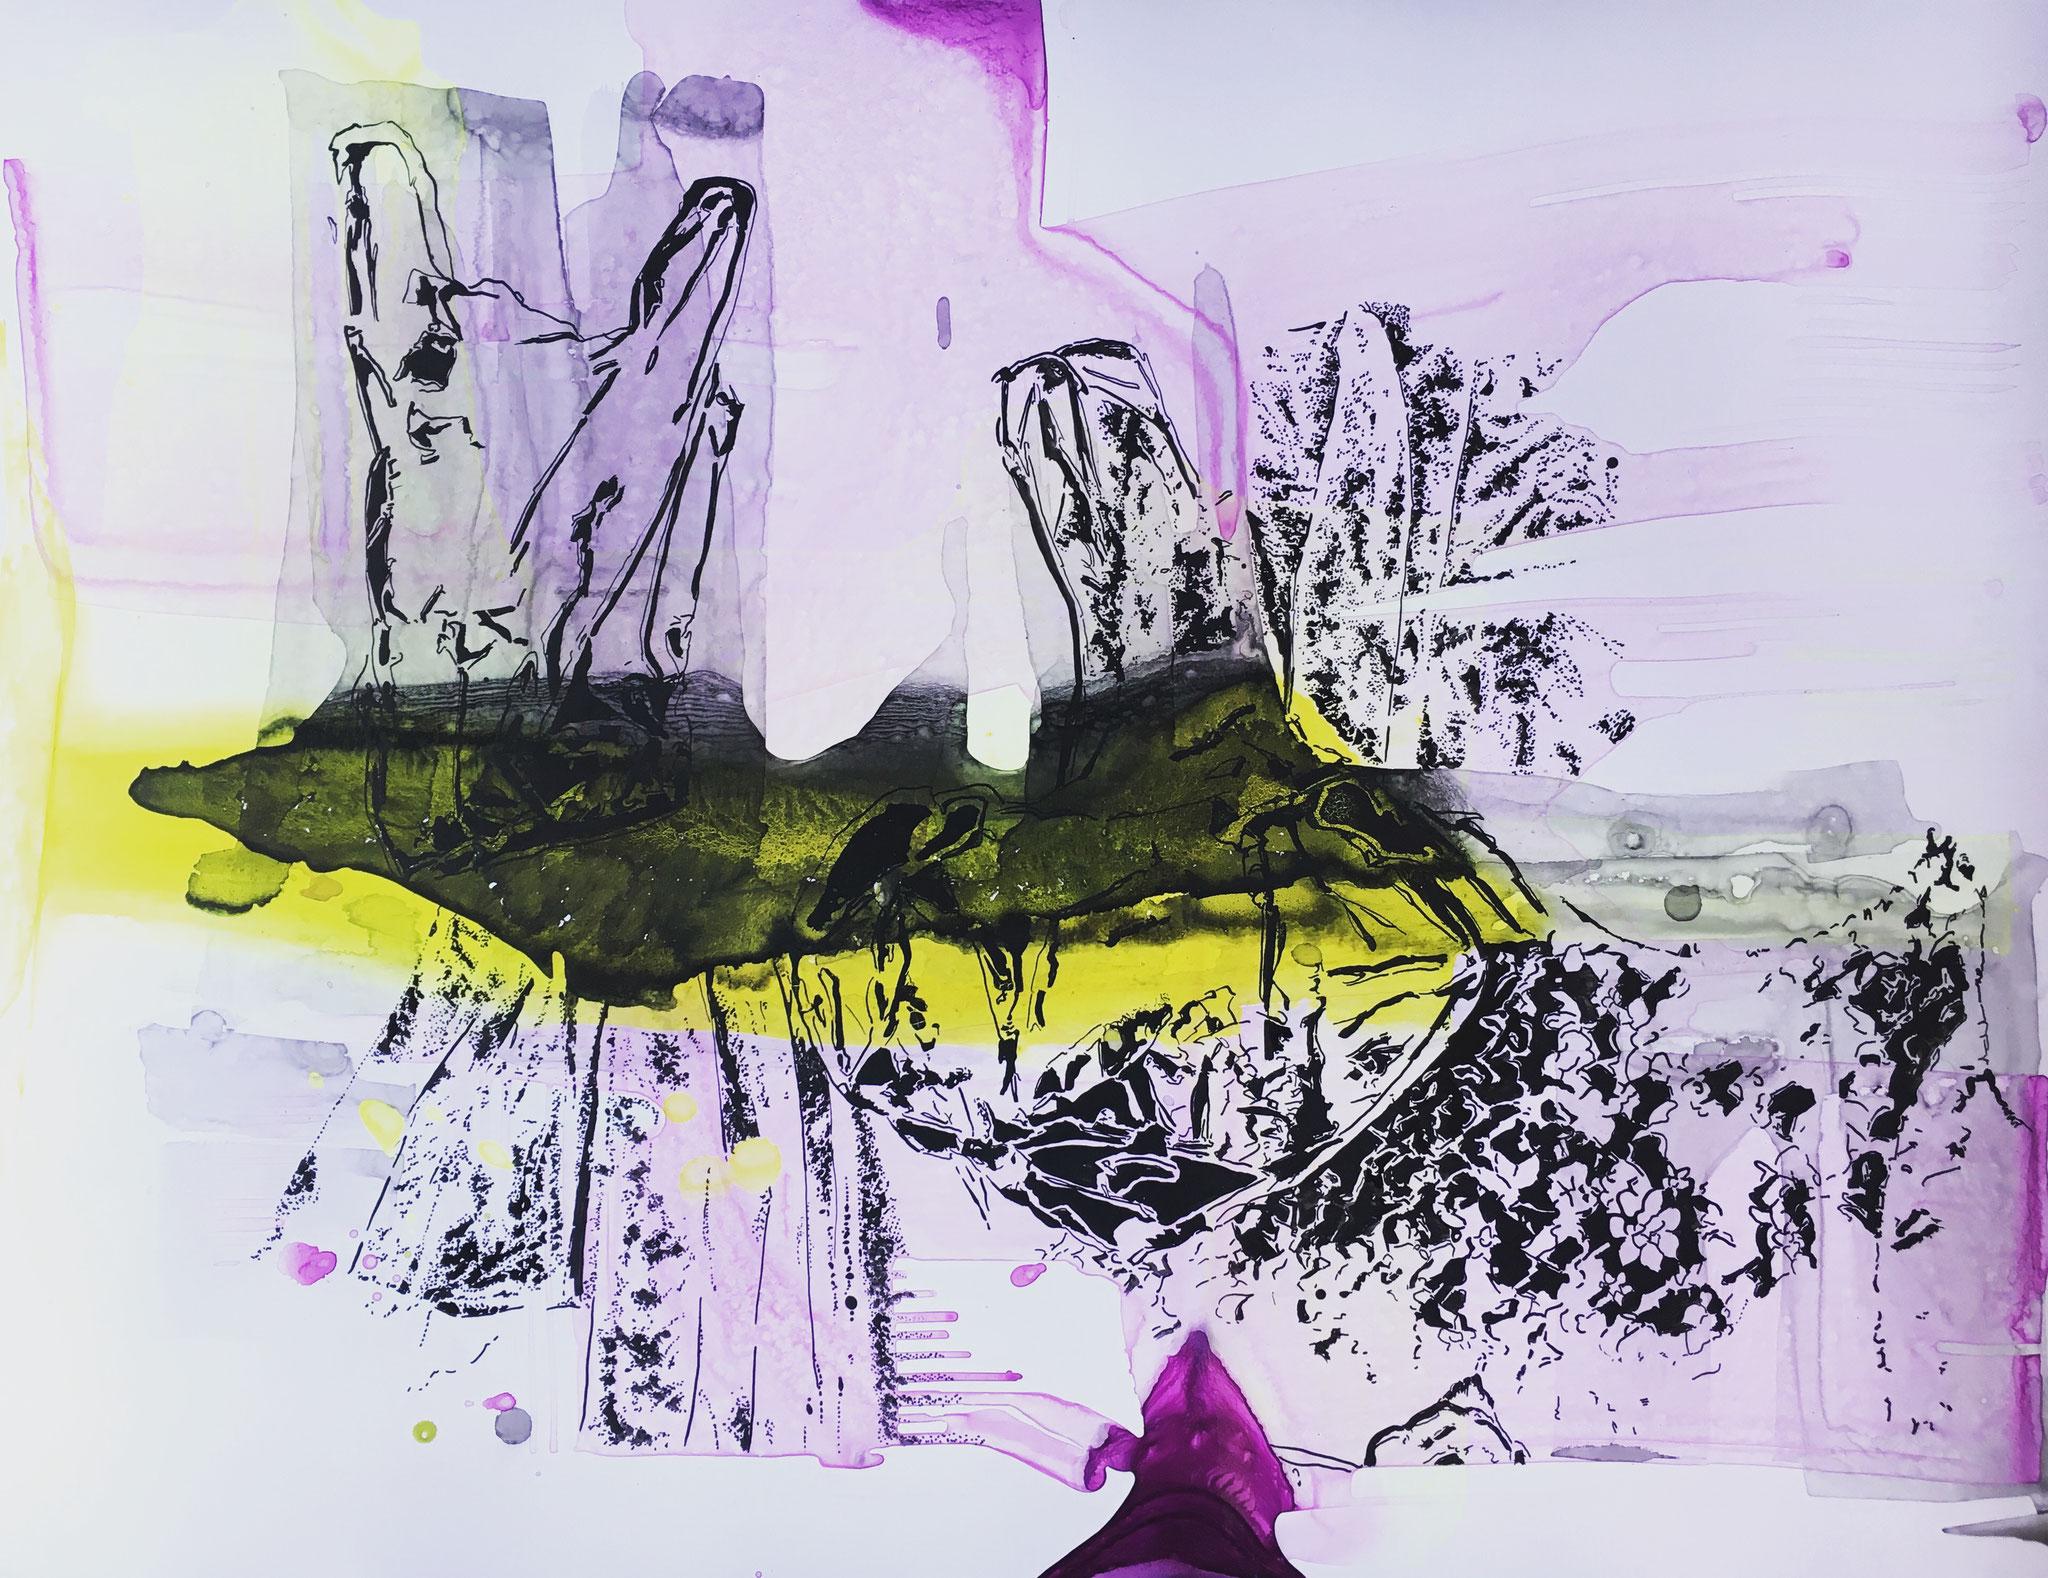 Joana Fischer, Plastic landscape II - Plastiklandschaft II, 2017, ink on yupo, 20 x 26 inches